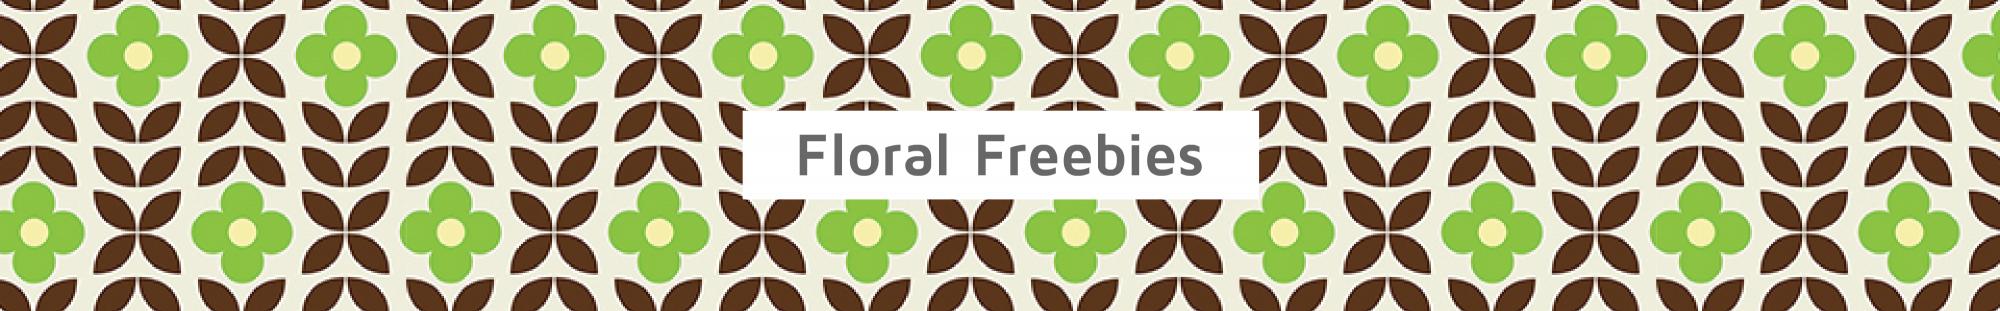 Freebies Banner-07